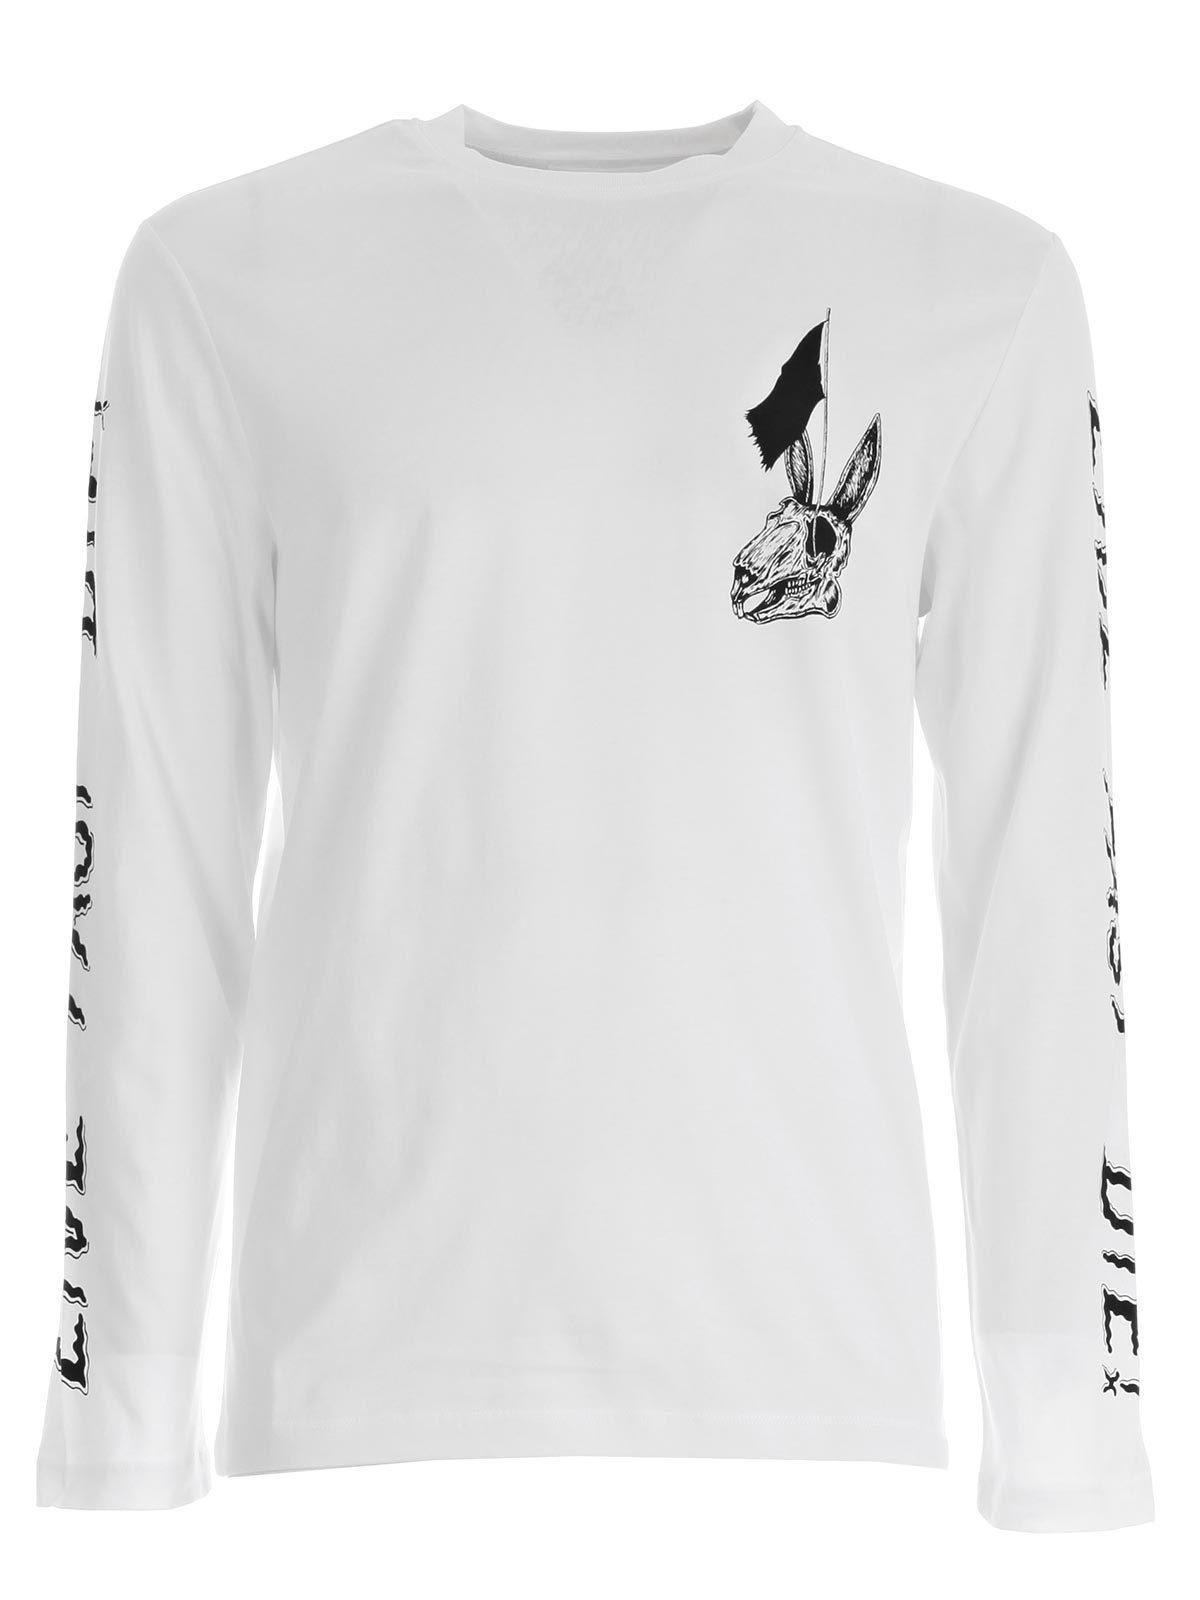 68040cd3 Lyst - McQ Bunny Long Sleeve Shirt in White for Men